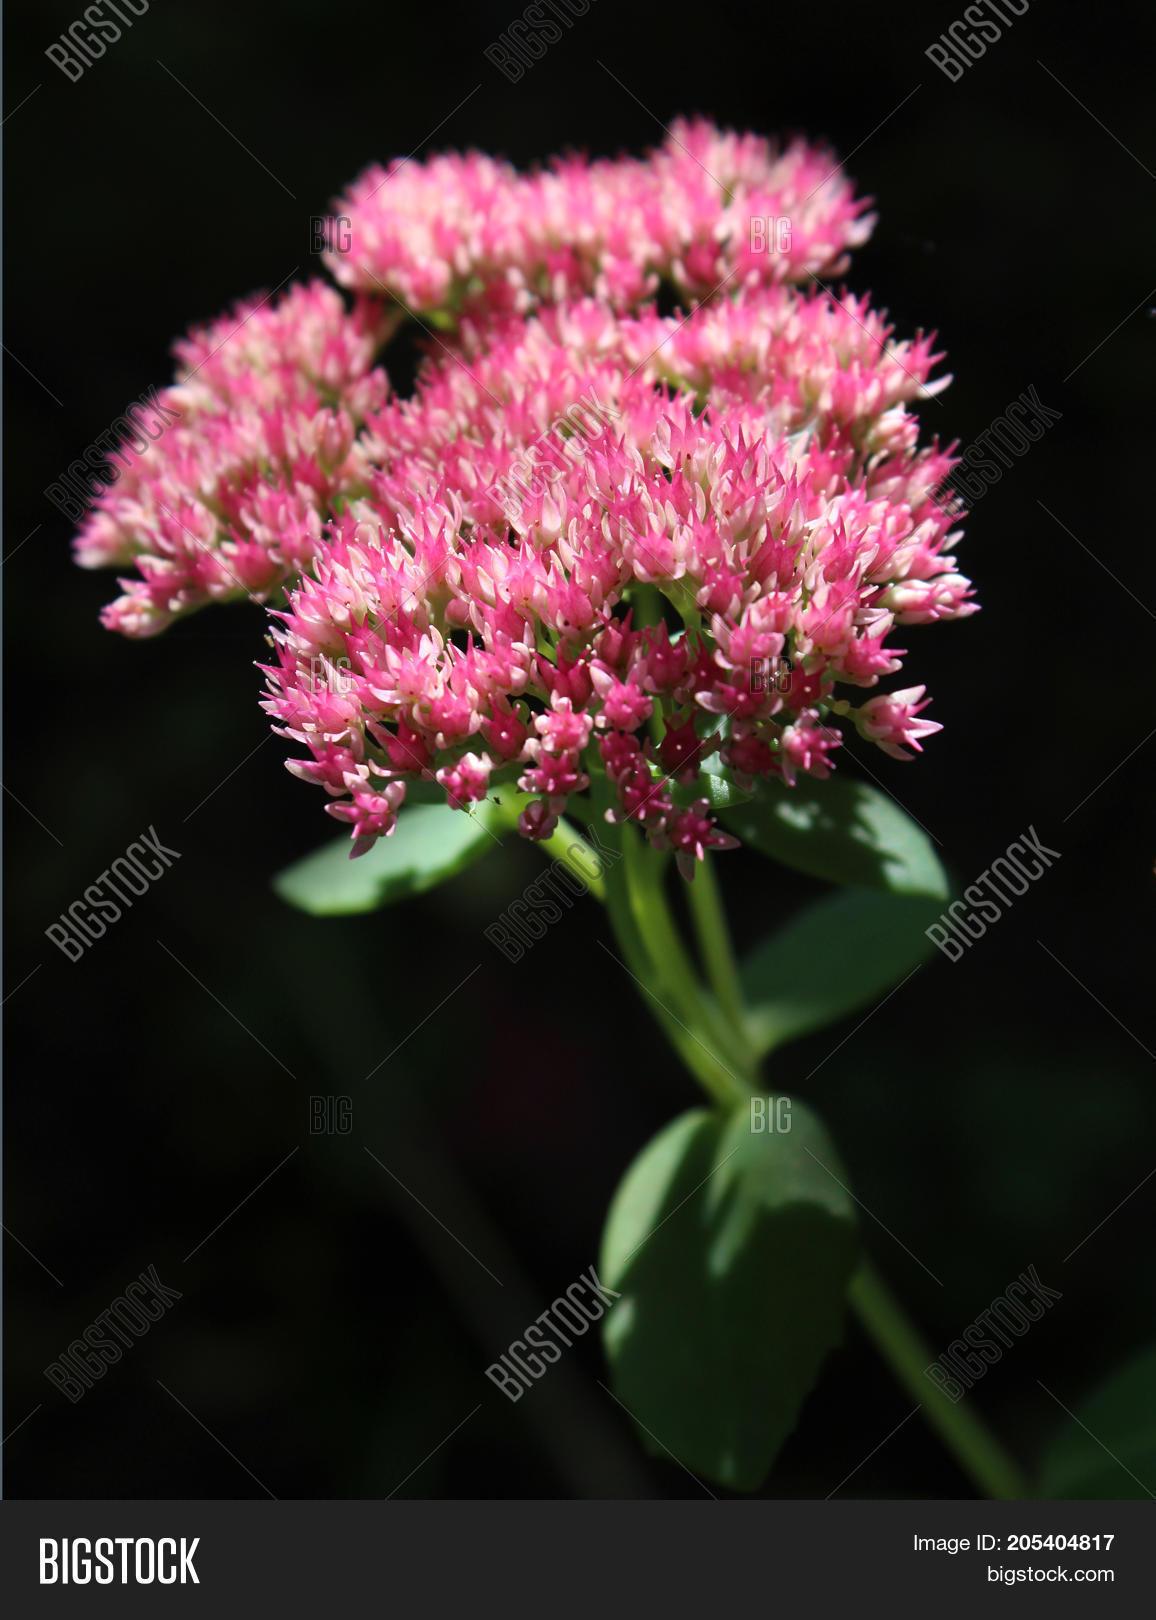 Beautiful Pink Autumn Flowers Sedum Image Photo Bigstock